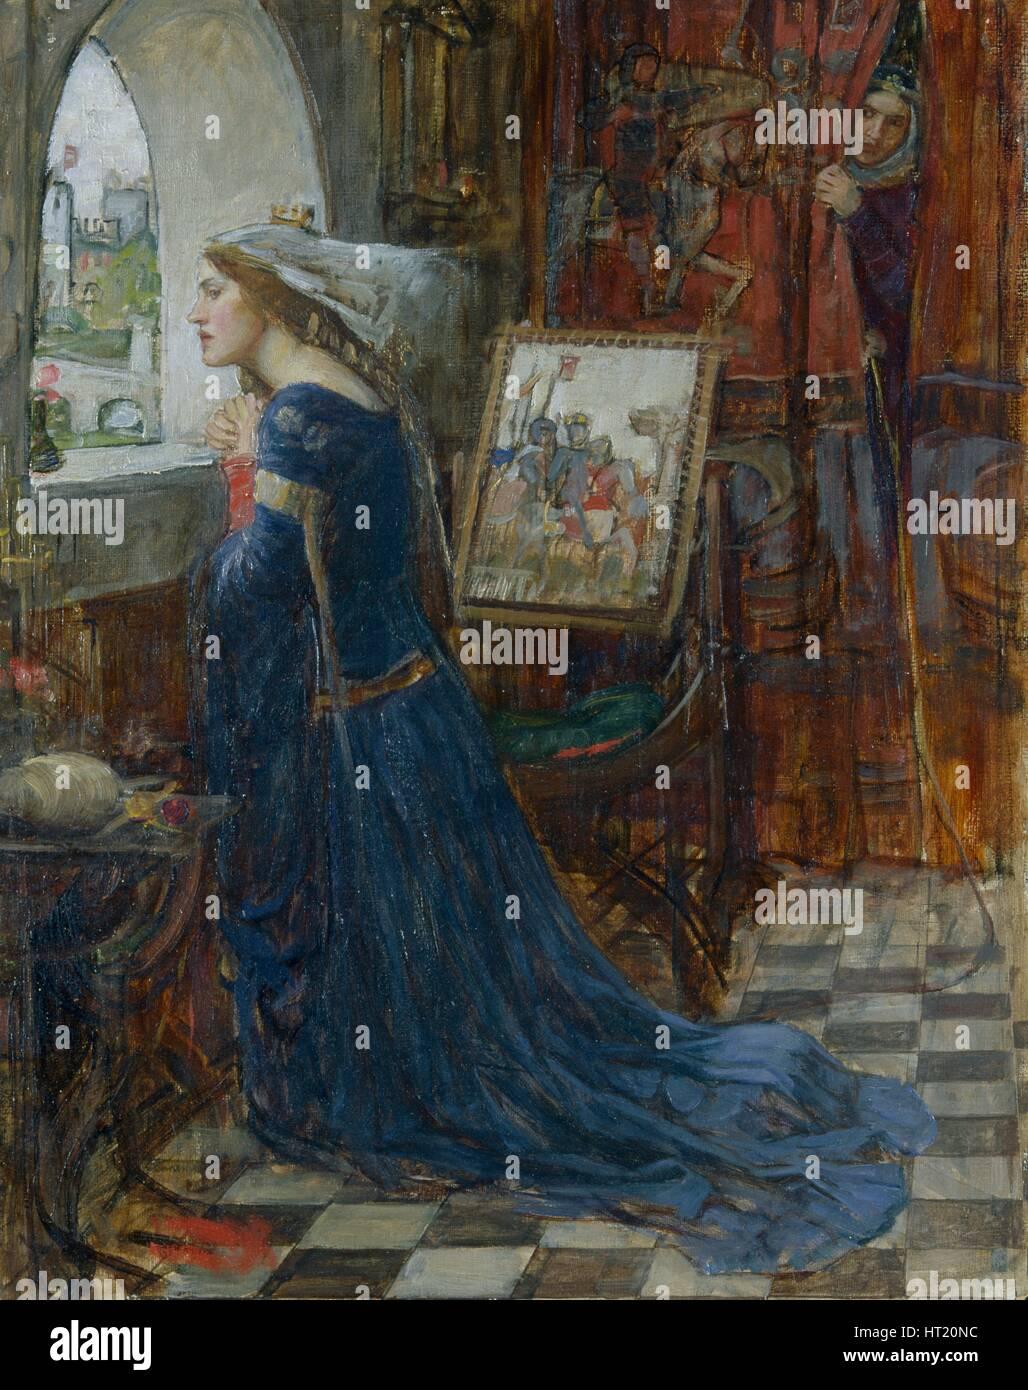 'Fair Rosamund', 1916. Artist: John William Waterhouse. - Stock Image